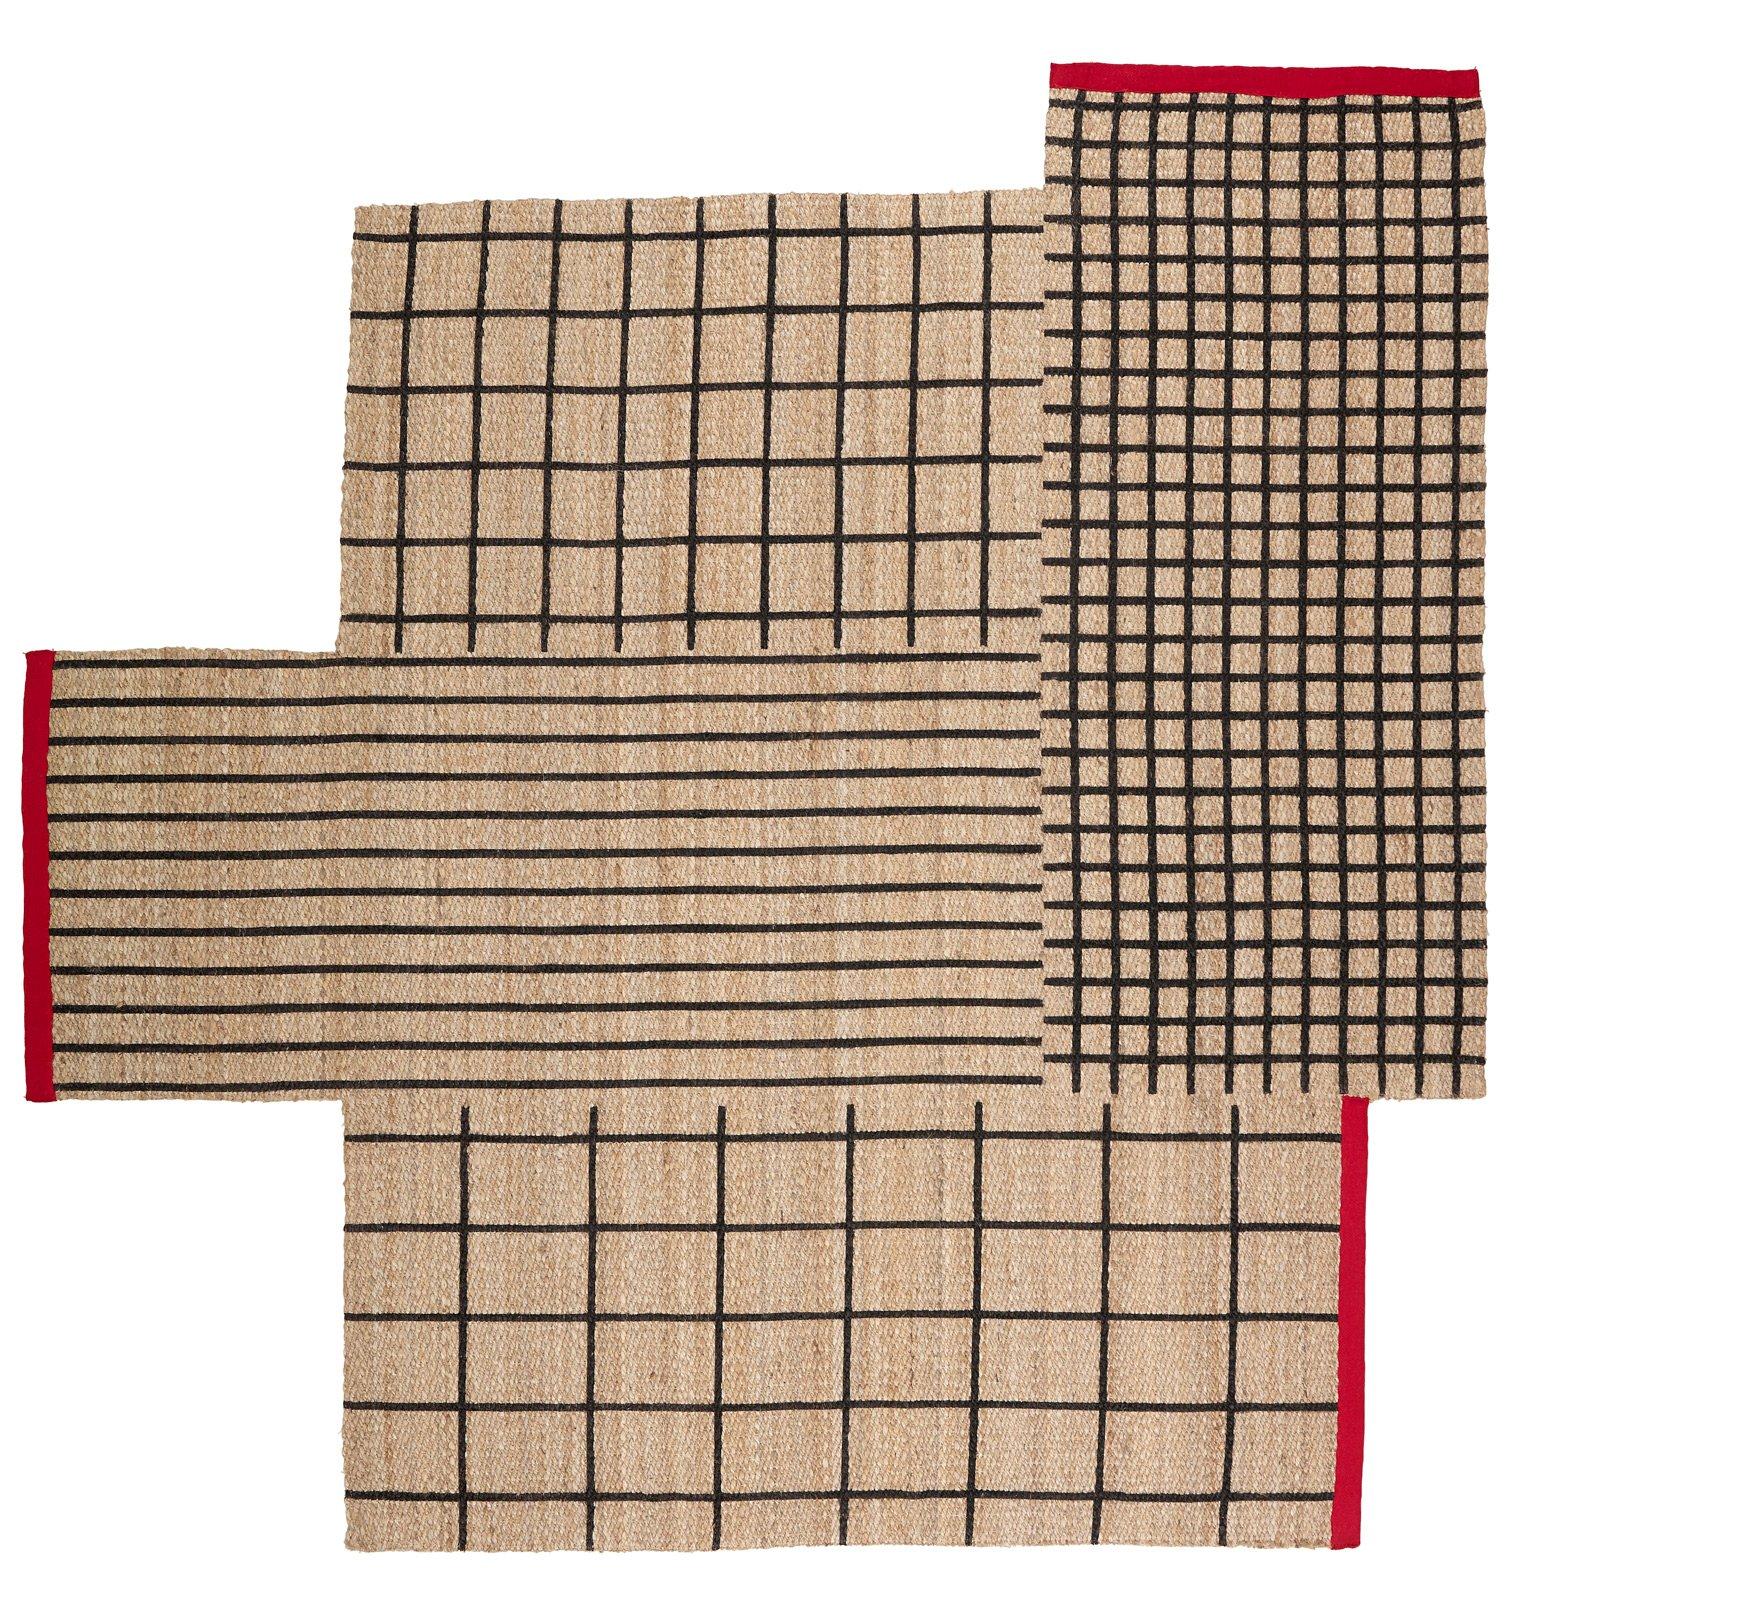 Lavare Tappeto Lana Ikea tappeti moderni, colorati o decorativi. da 50 a 500 euro